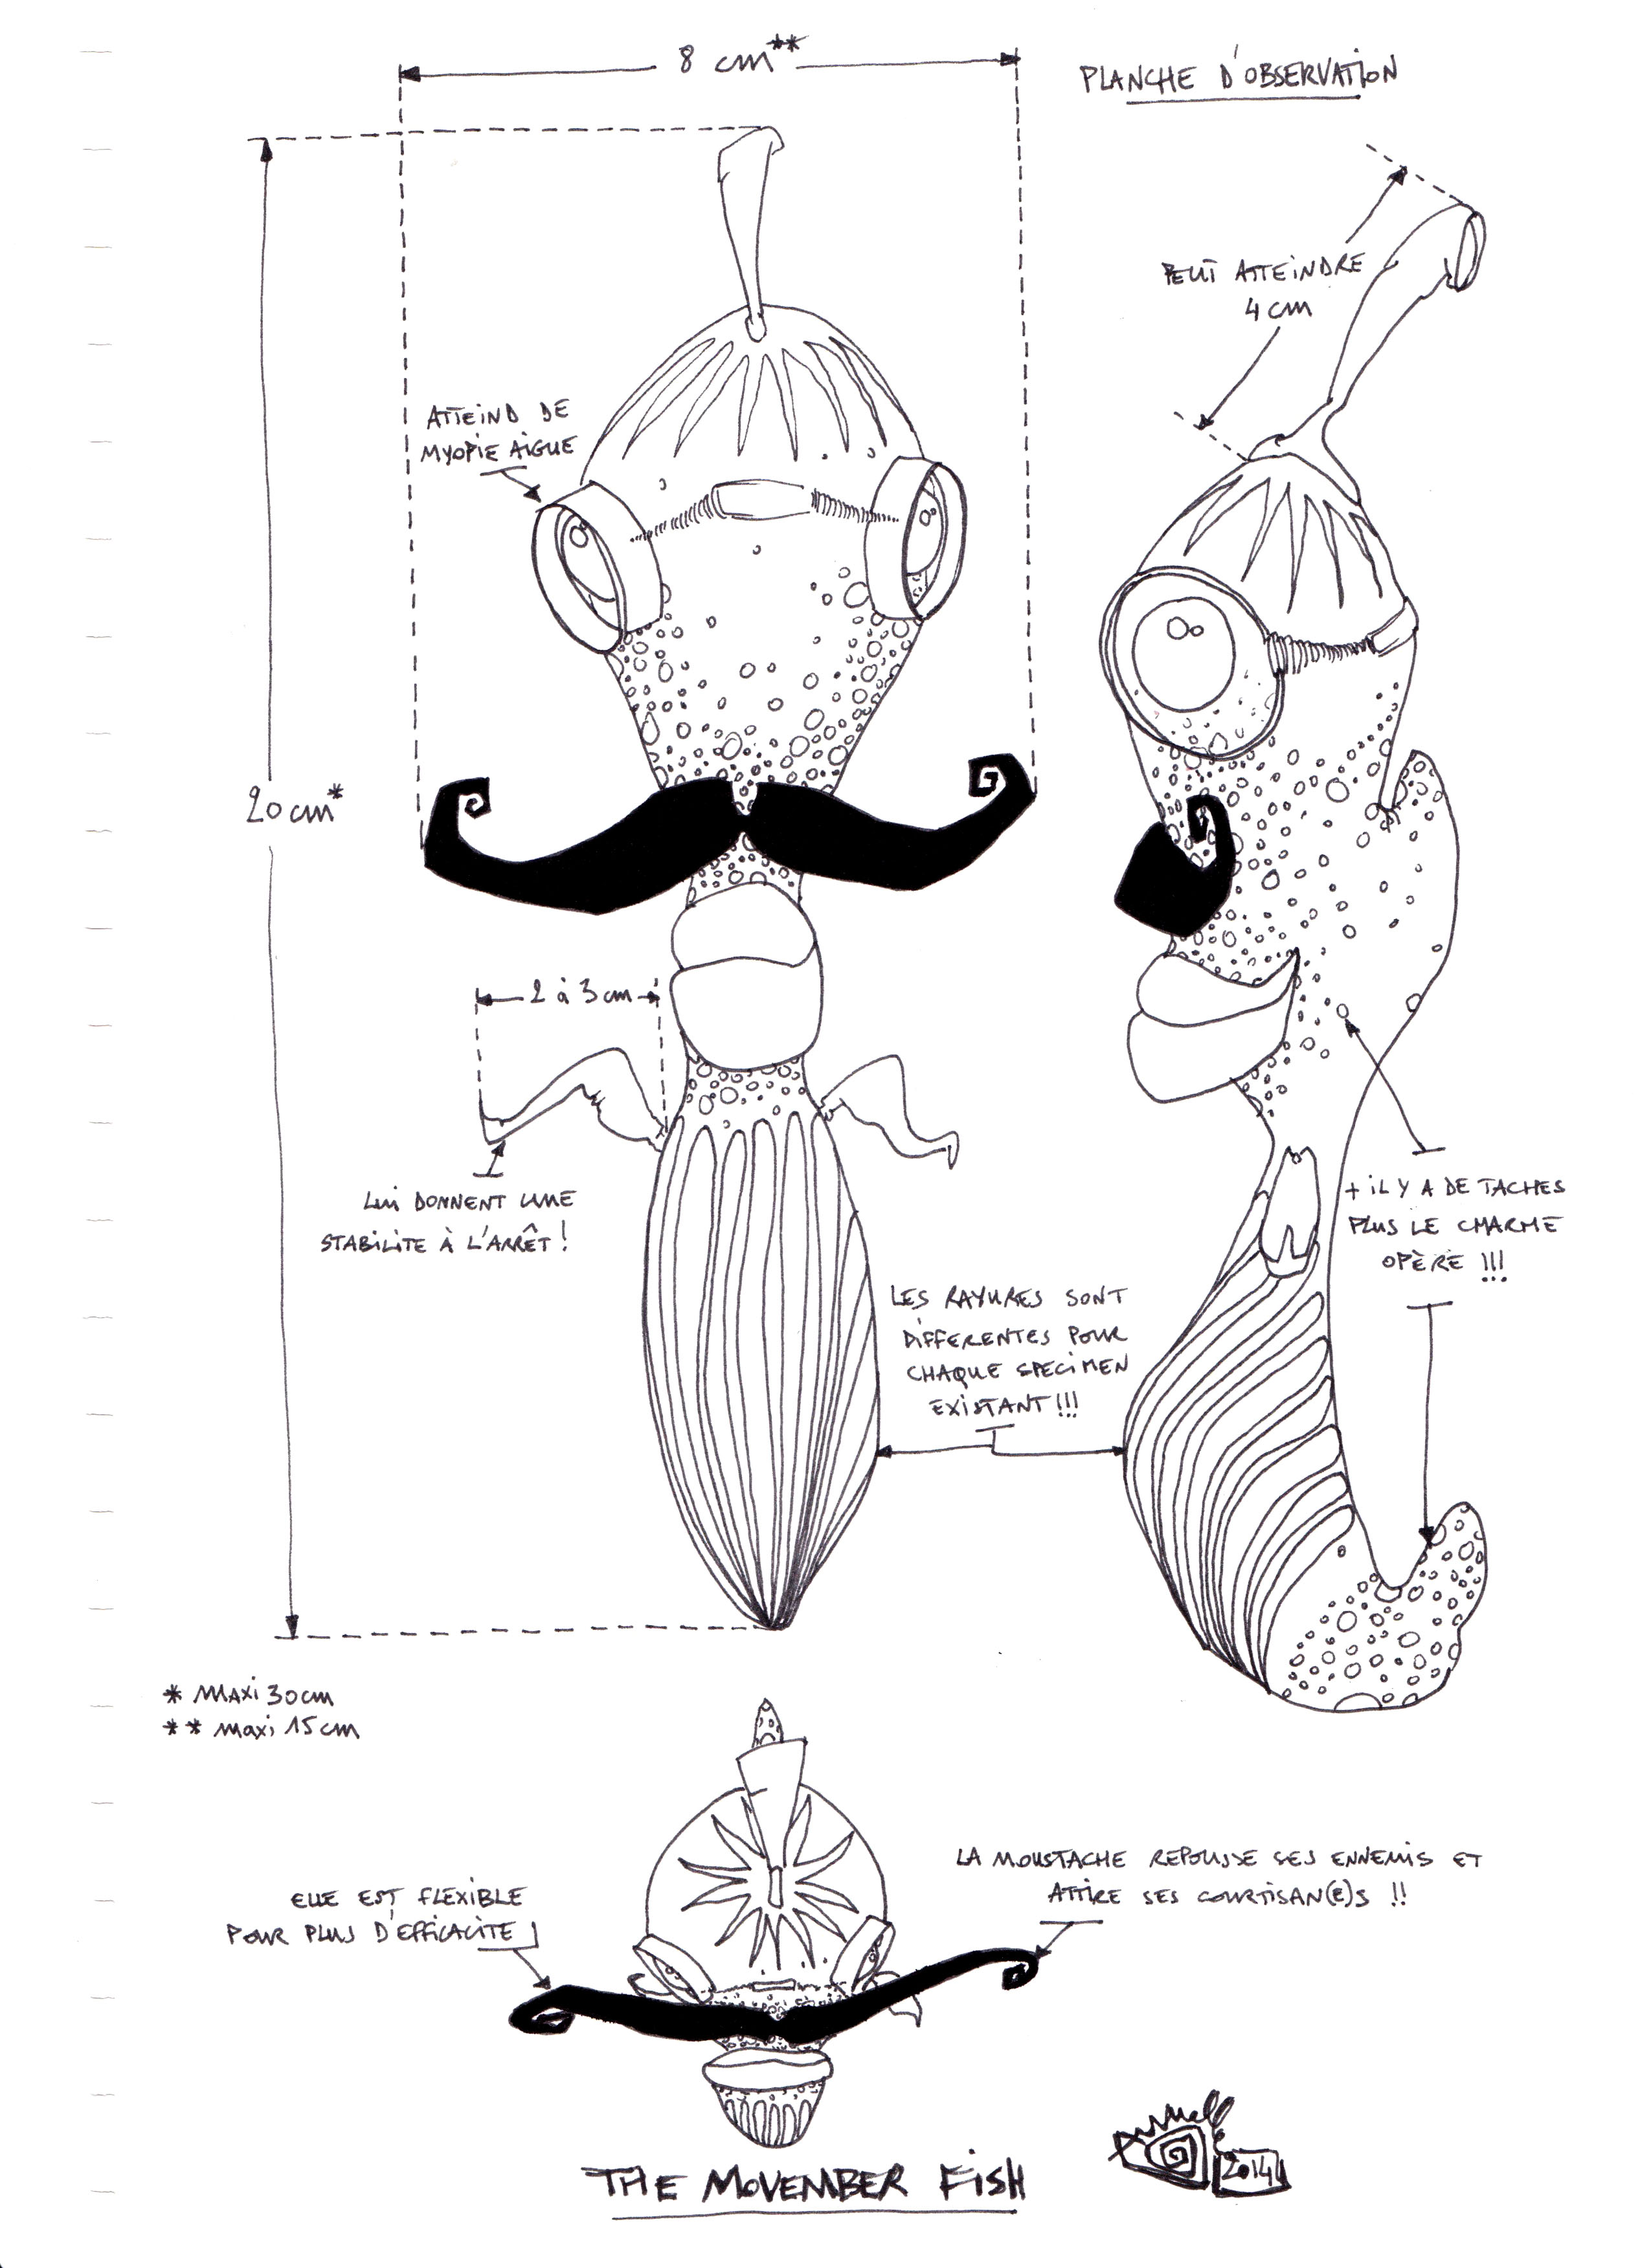 The movember fish